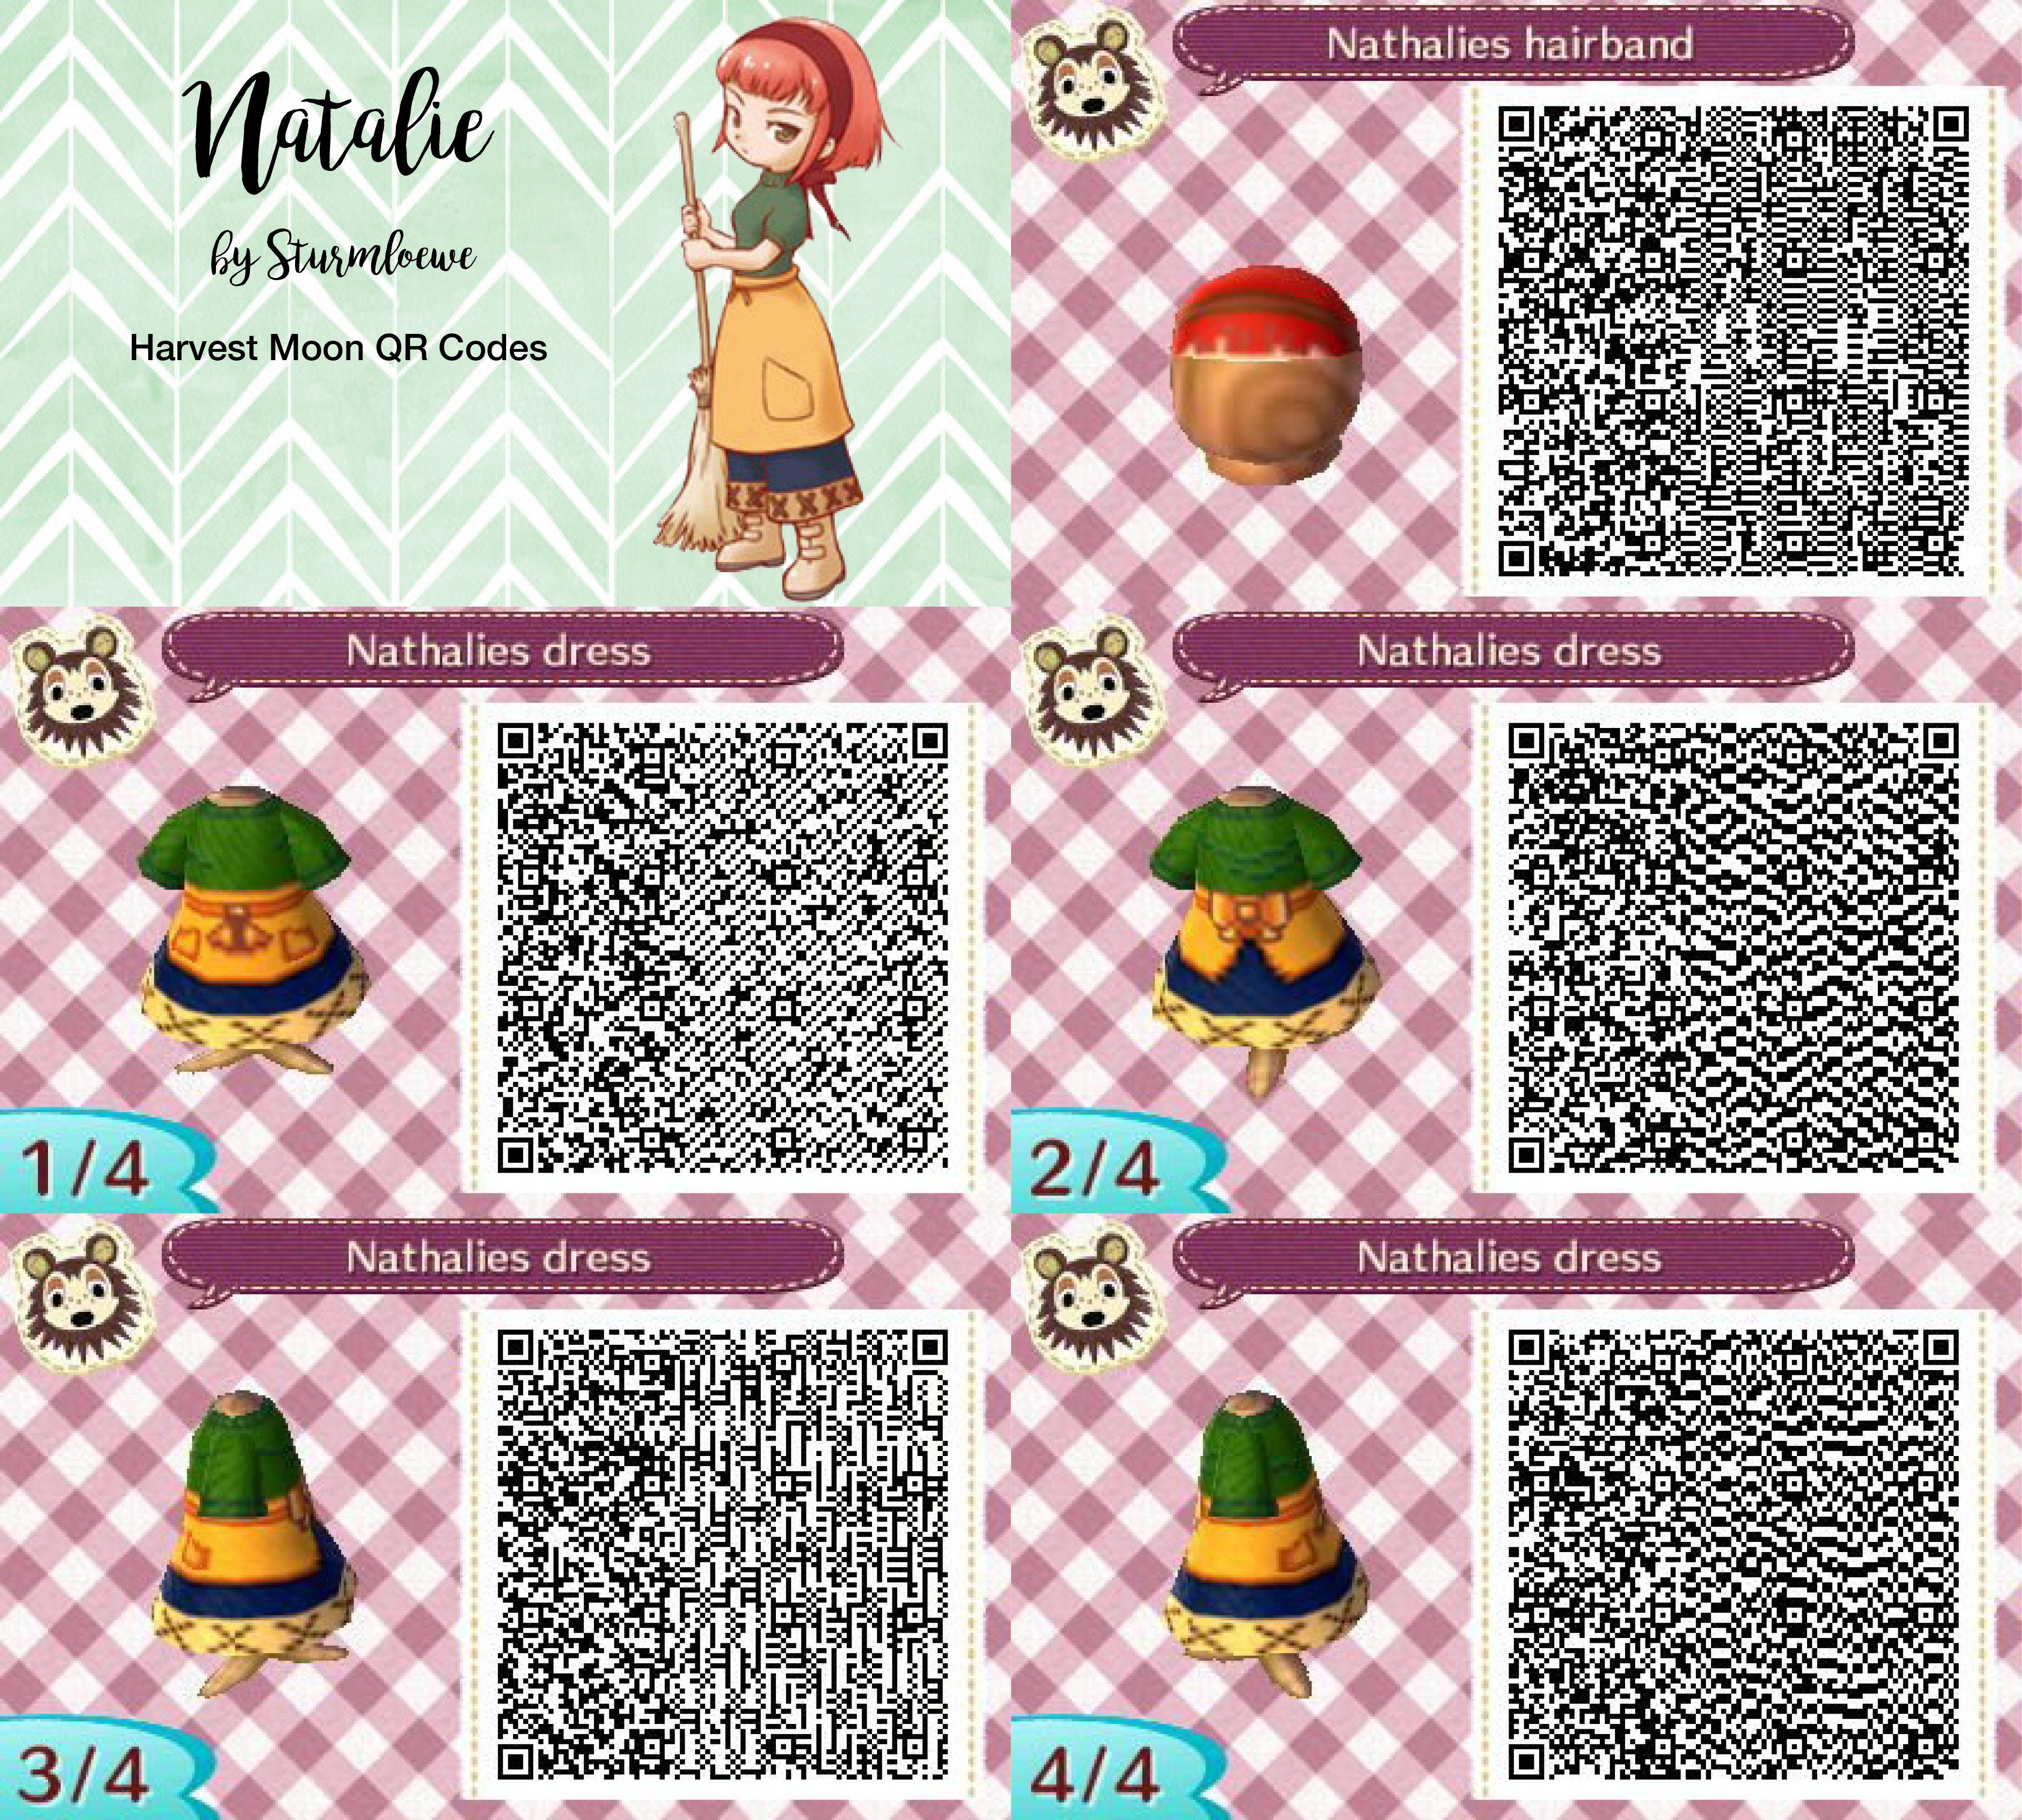 Leather jacket qr code new leaf - Harvest Moon Natalies Dress For Animal Crossing New Leaf Natalie Qr Code